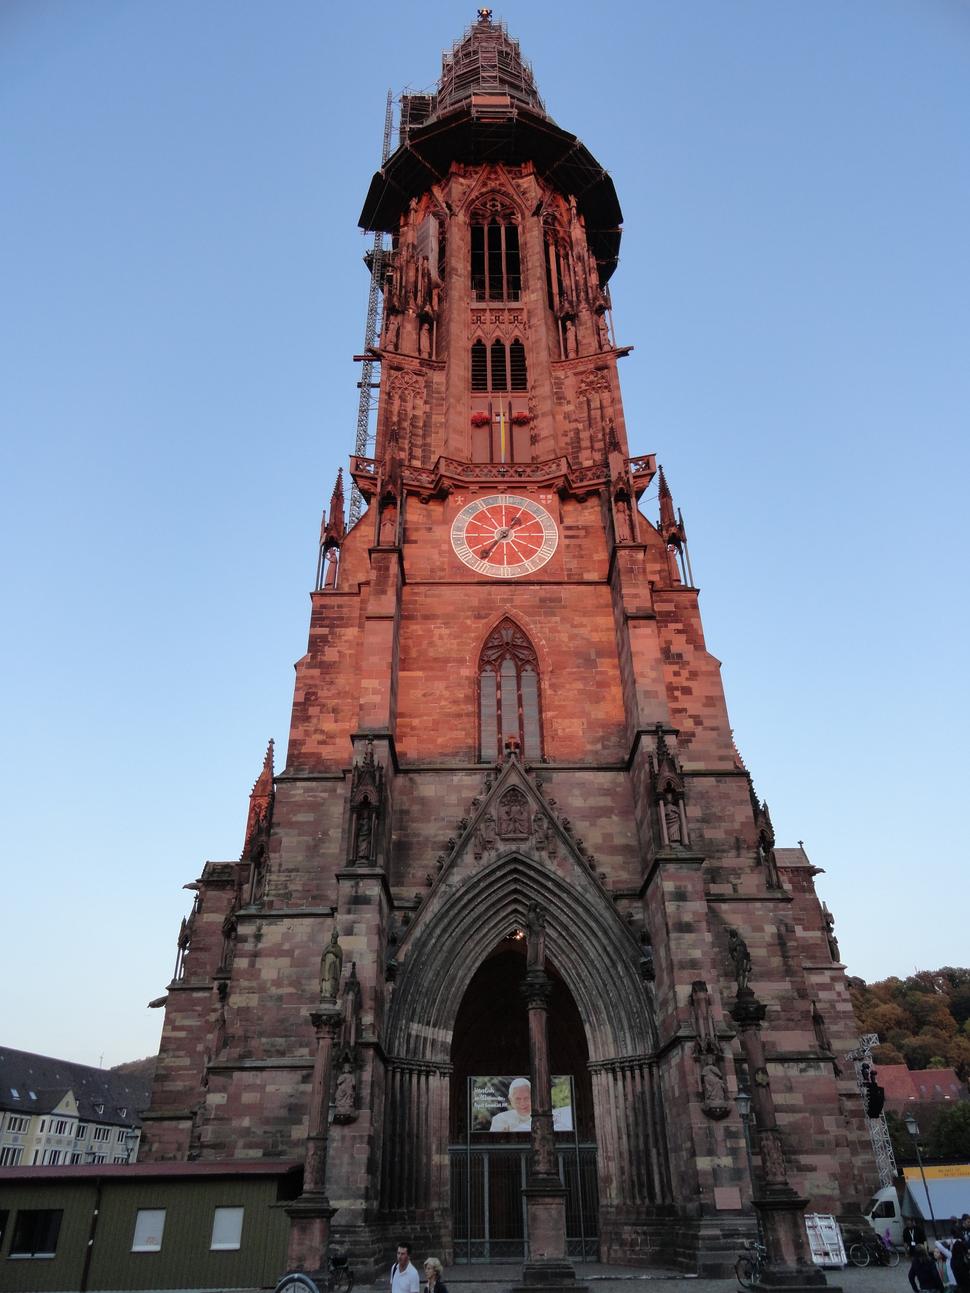 Freiburger-muenster